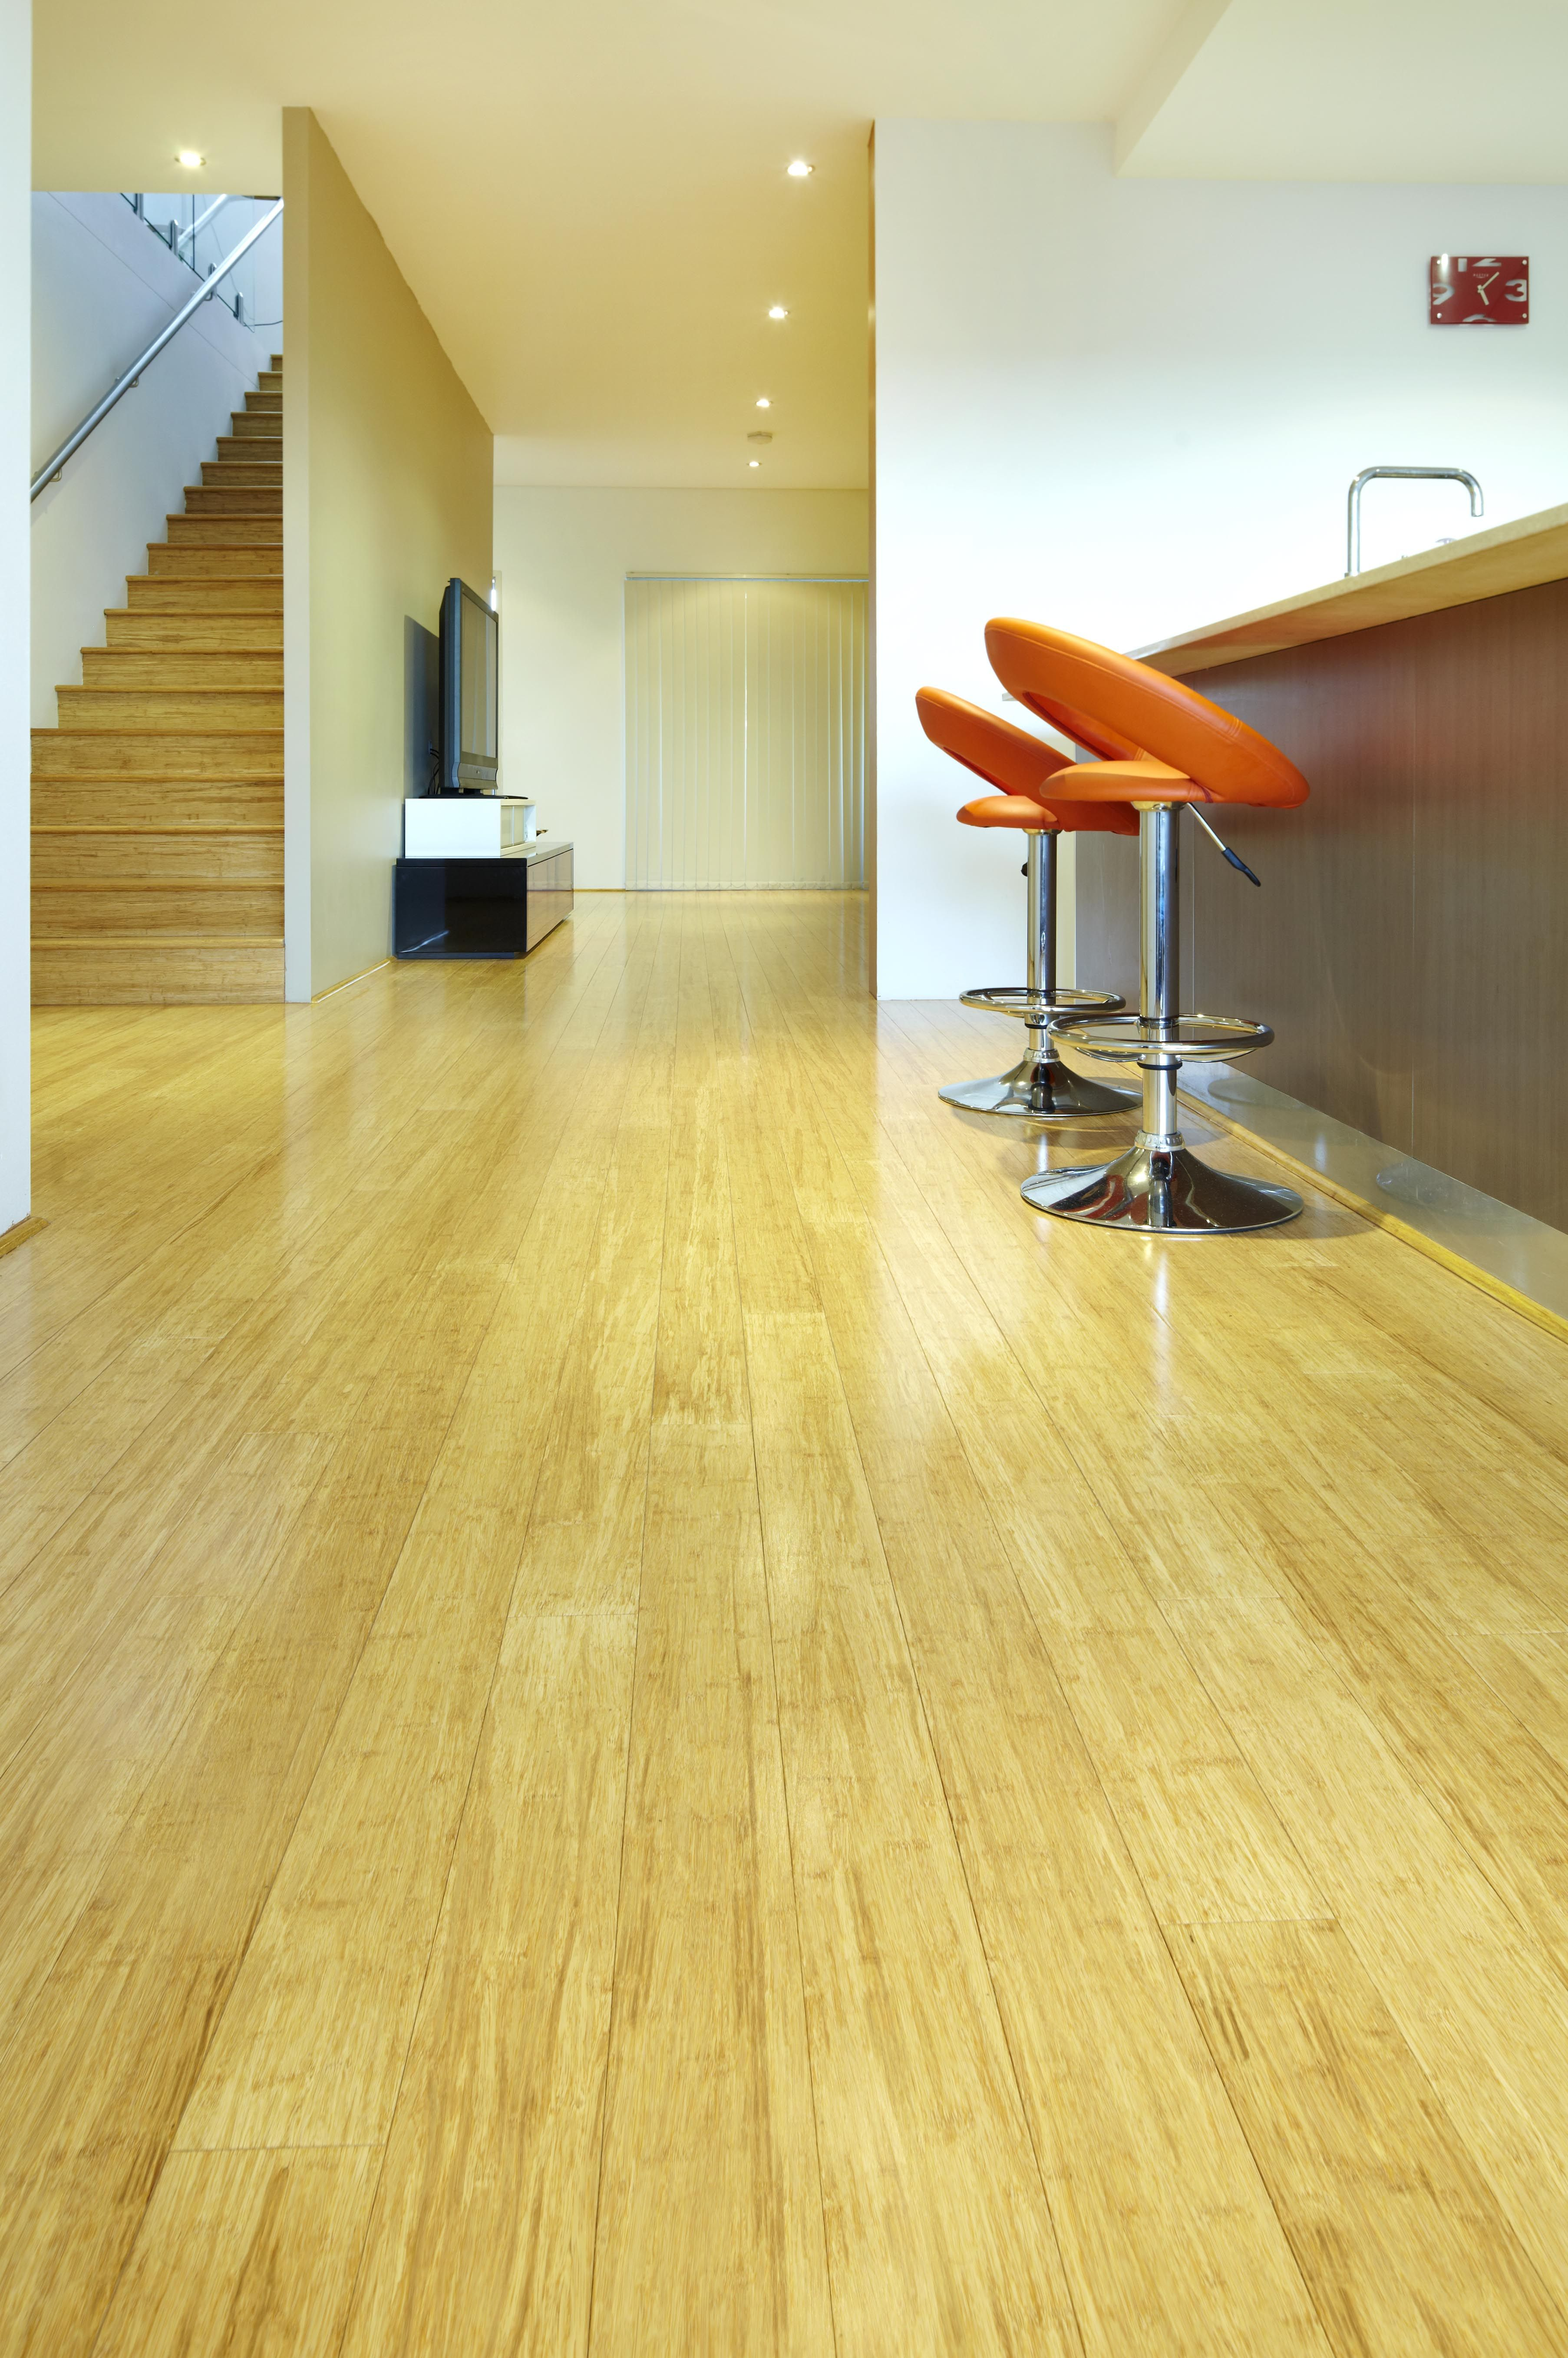 Bamboo Flooring Green Alternatives to Timber Floors Stonewood